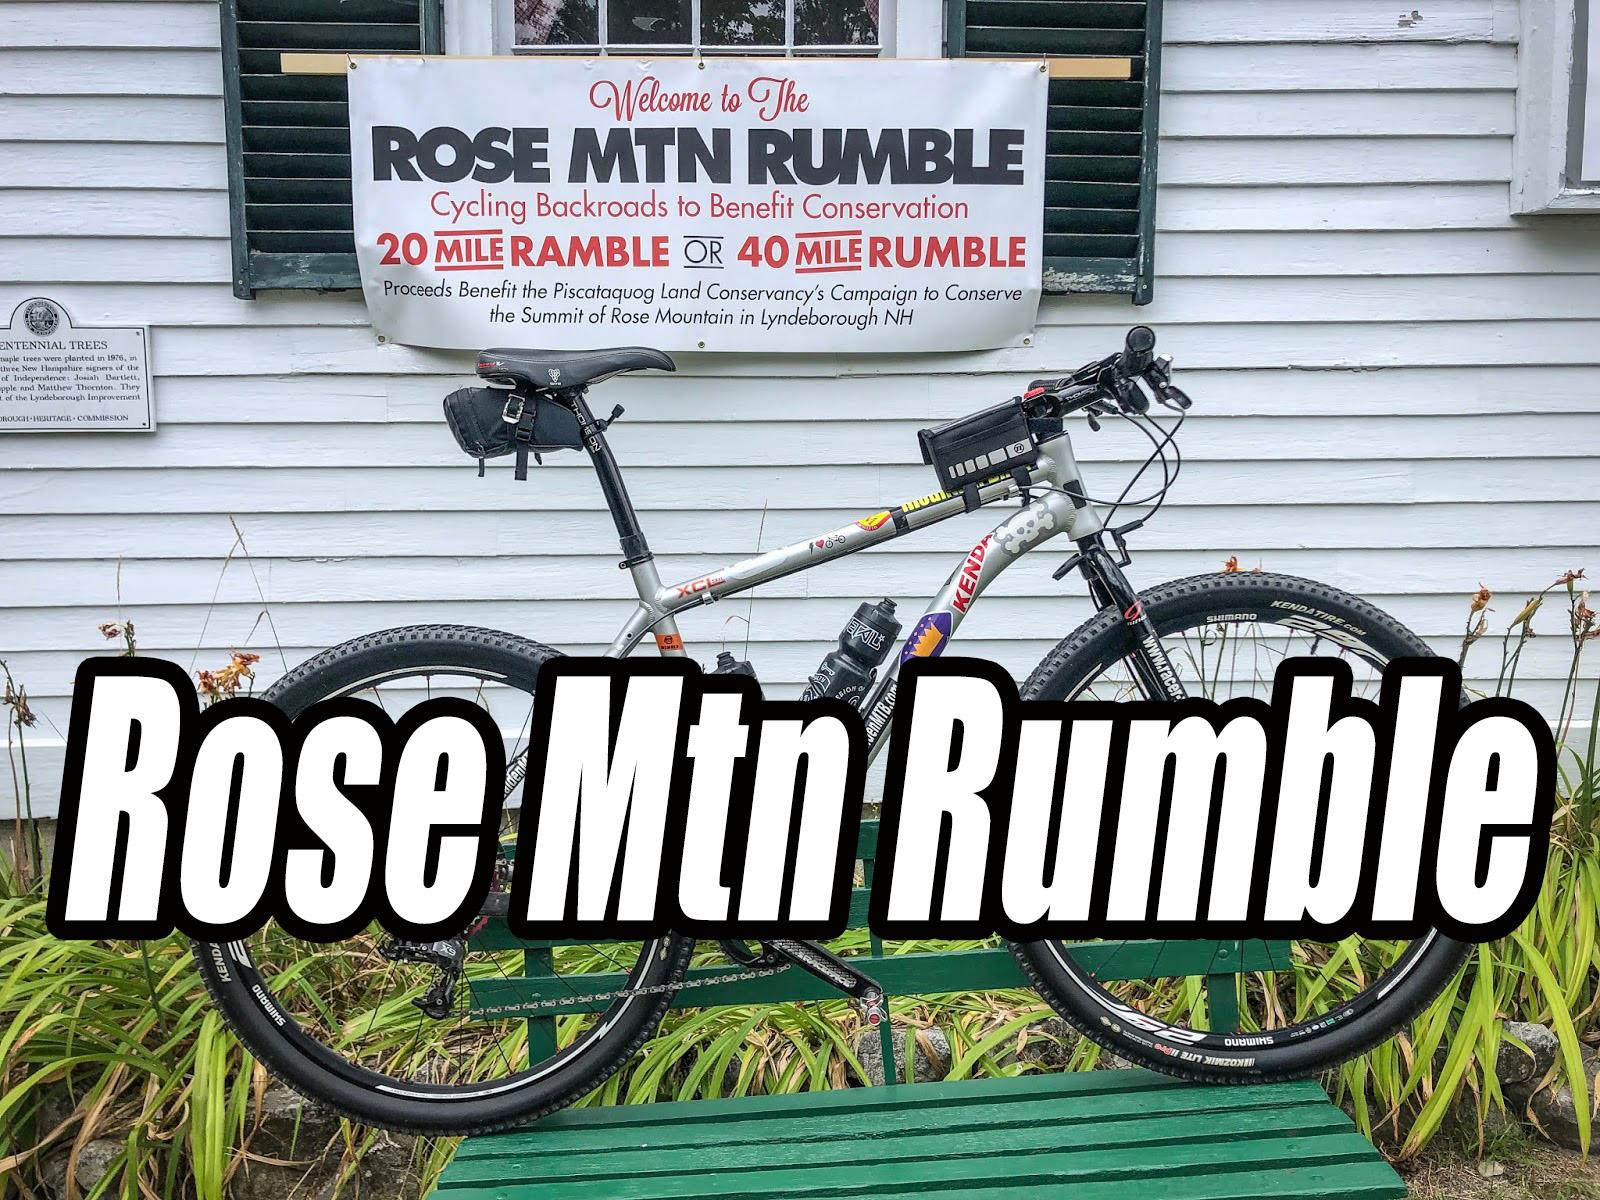 Rose Mountain Rumble